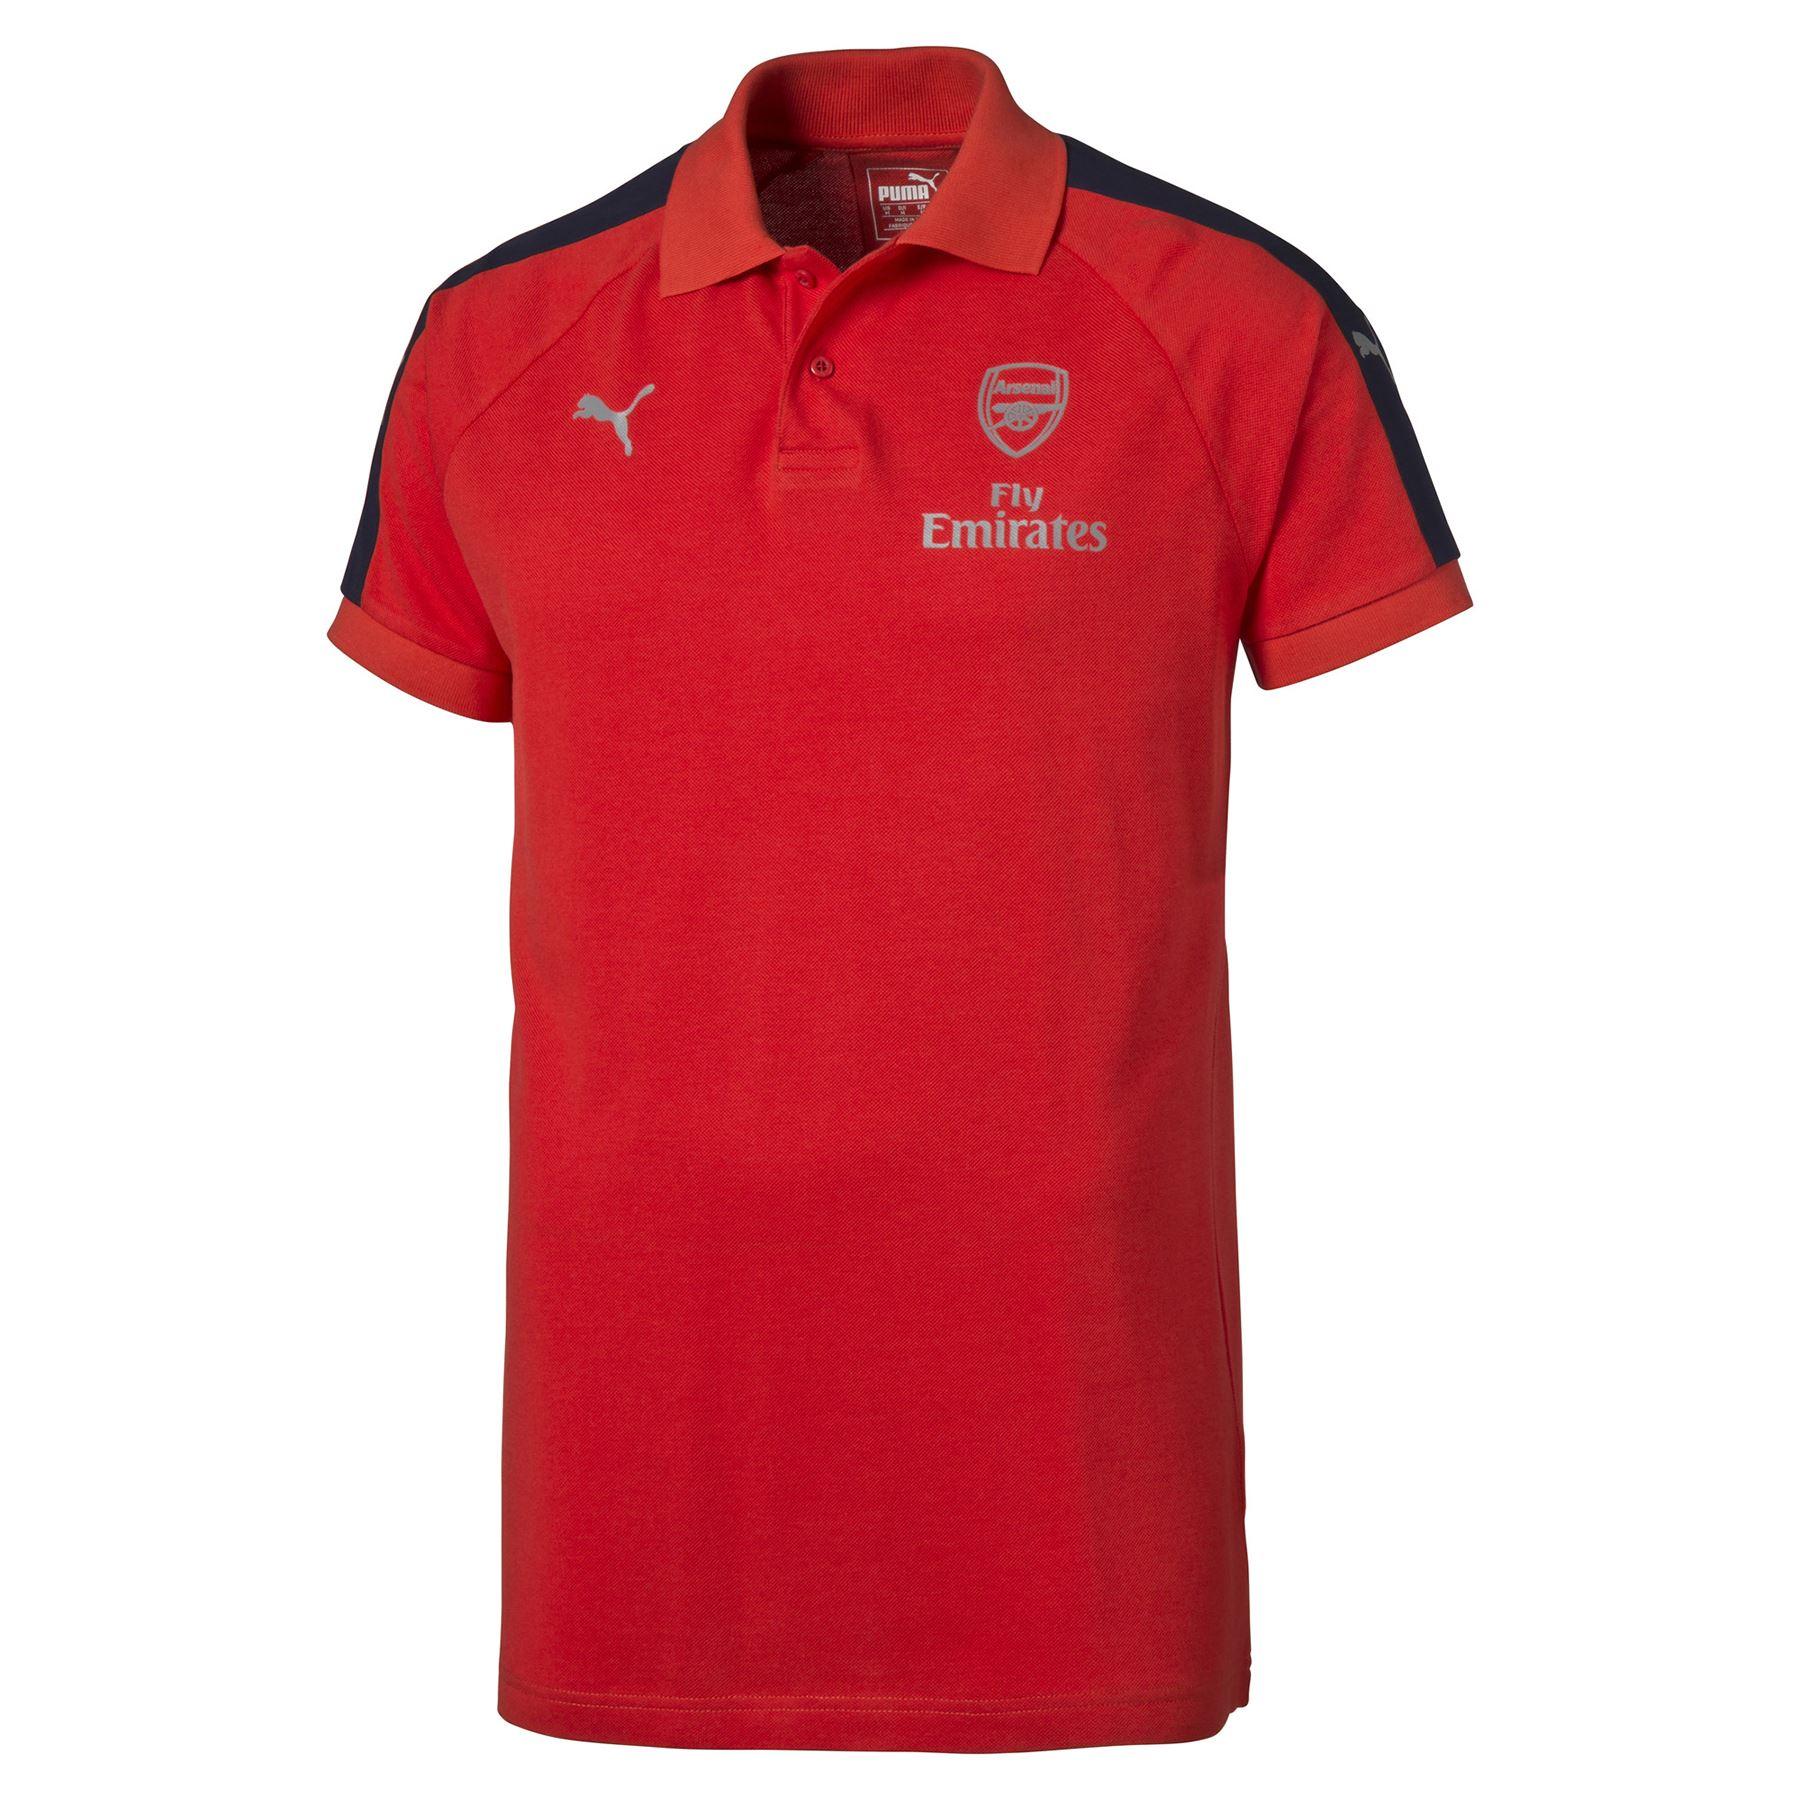 PUMA Men'S Jersey Football Sports Teamwear Shirt Jersey XS ... |Cool Puma Soccer Shirts